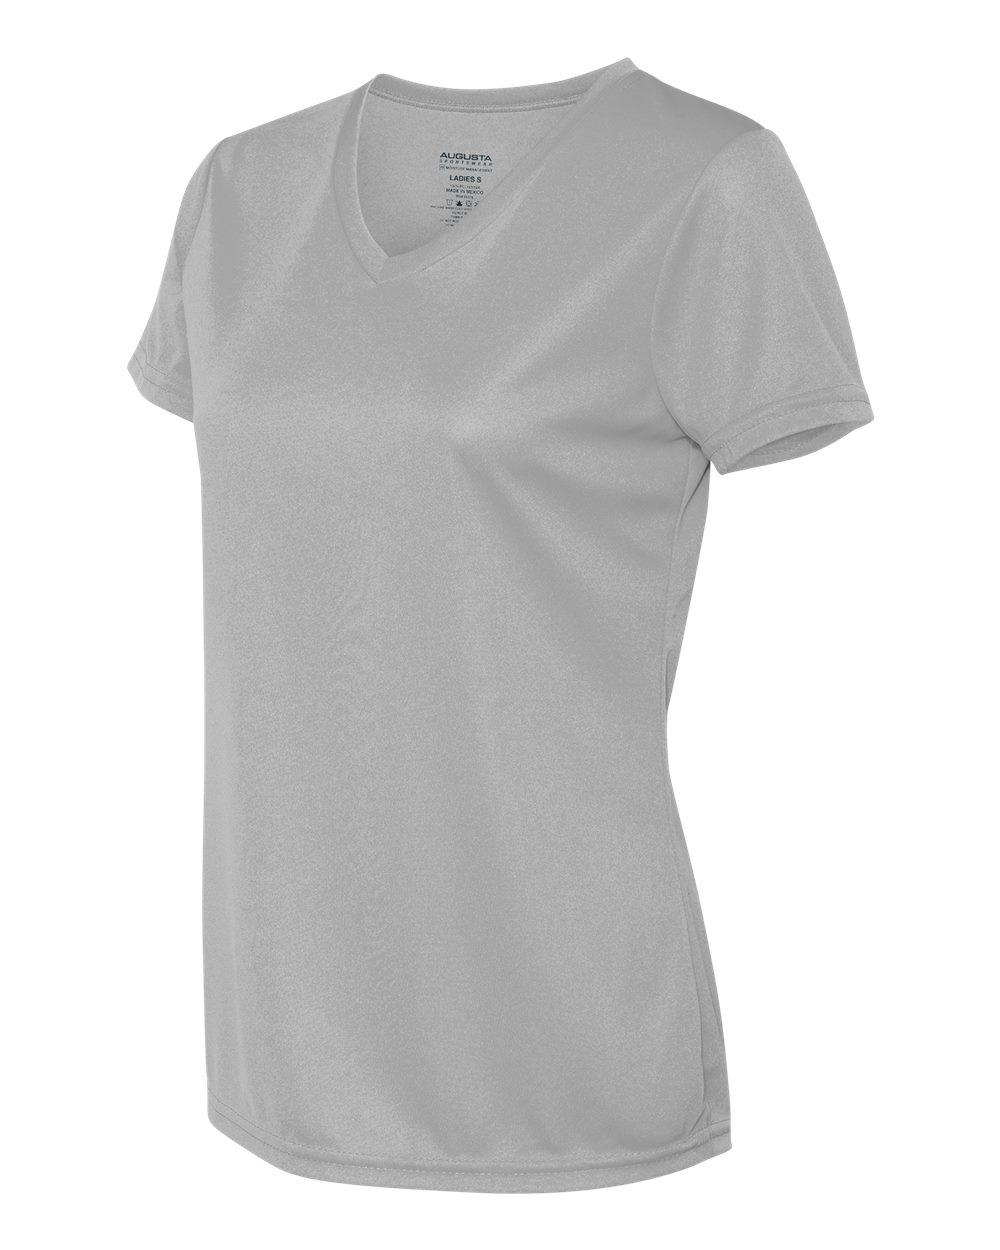 Augusta-Sportswear-Women-039-s-Moisture-Wicking-V-Neck-T-Shirt-1790-XS-2XL thumbnail 6